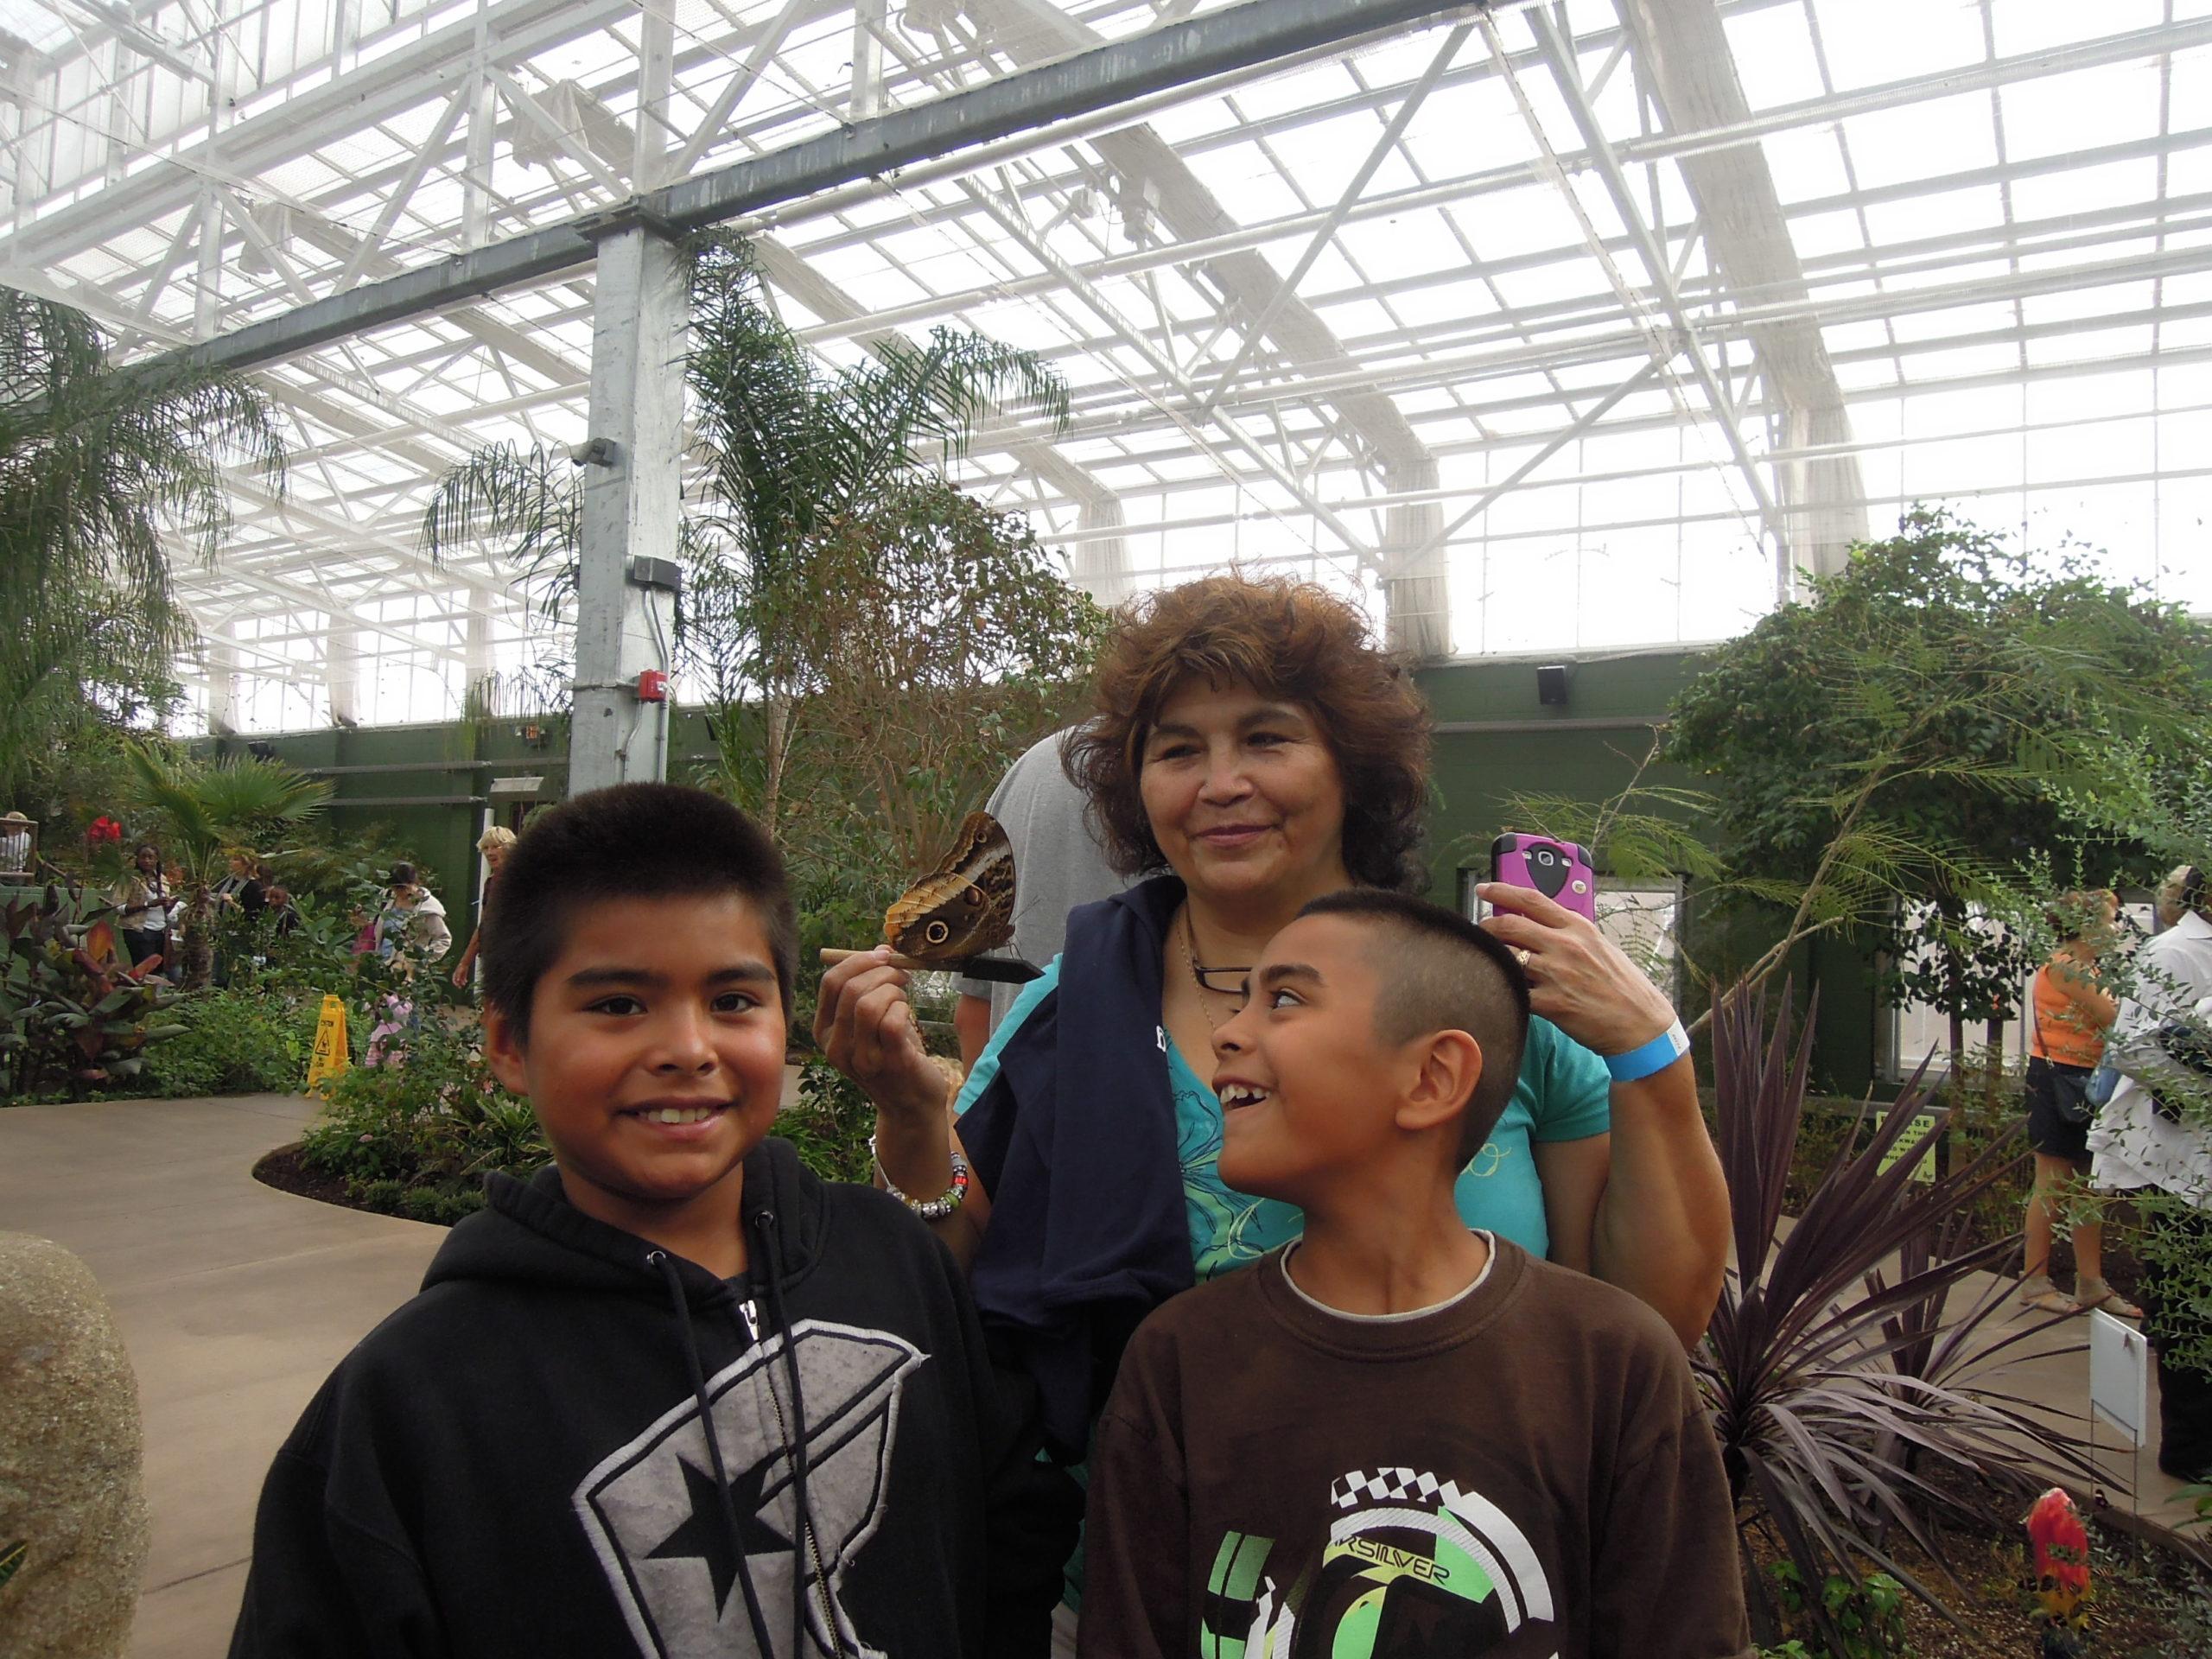 grandparents raising grandchildren, grandmother and grandsons, Butterfly Wonderland